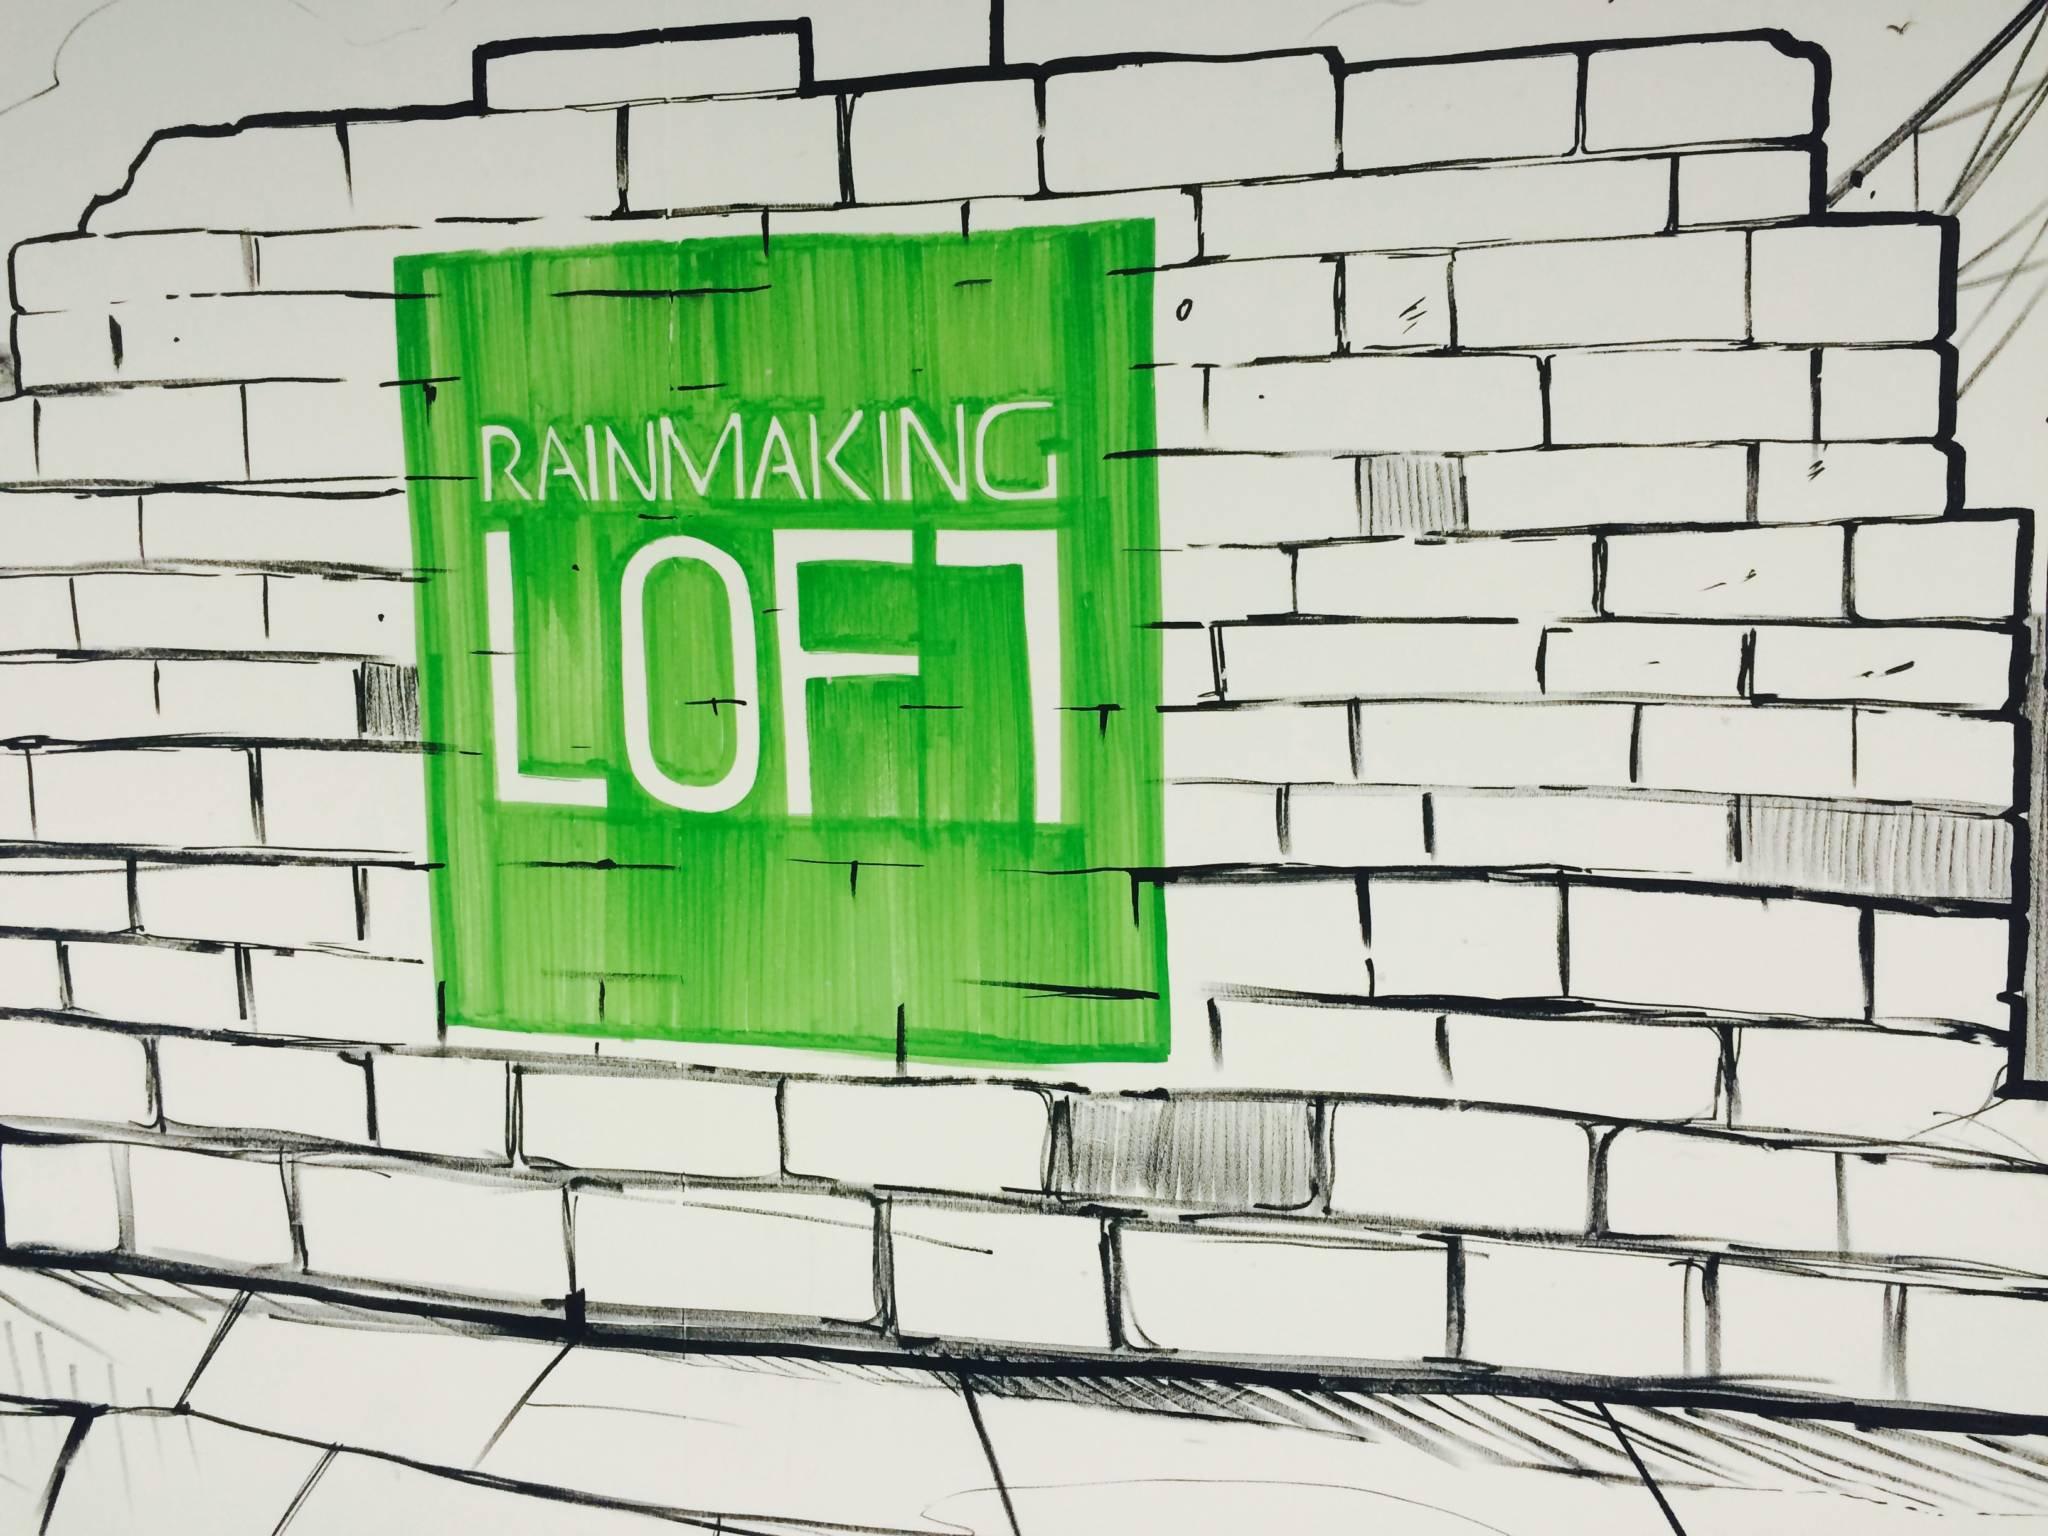 Rainmaking-Loft